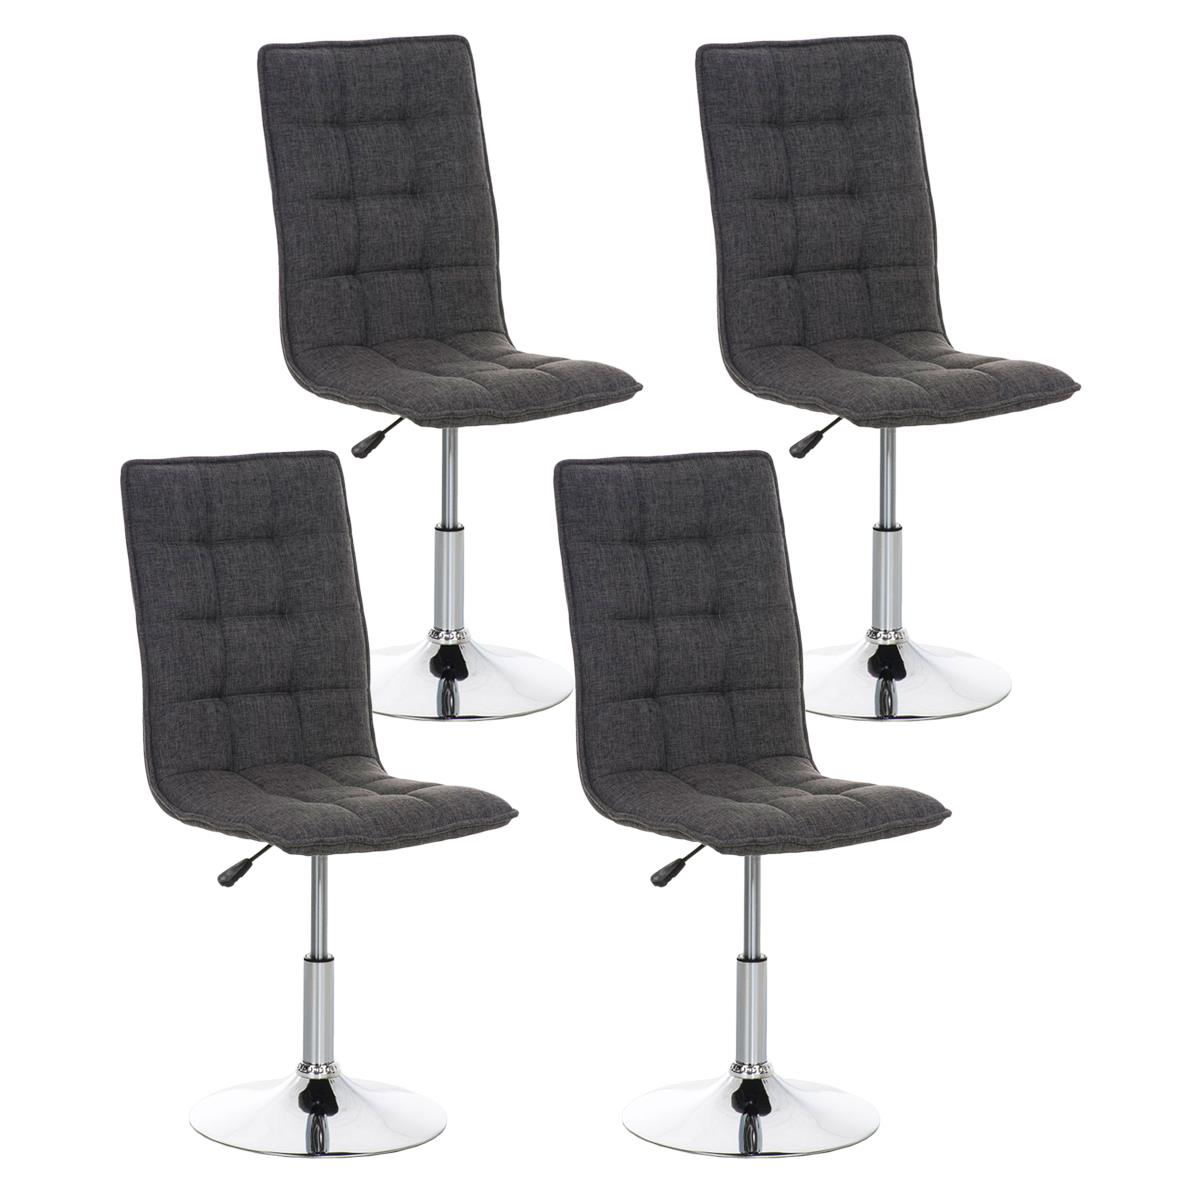 Conjunto de 4 sillas de comedor o cocina pescara en tela for Sillas grises para comedor